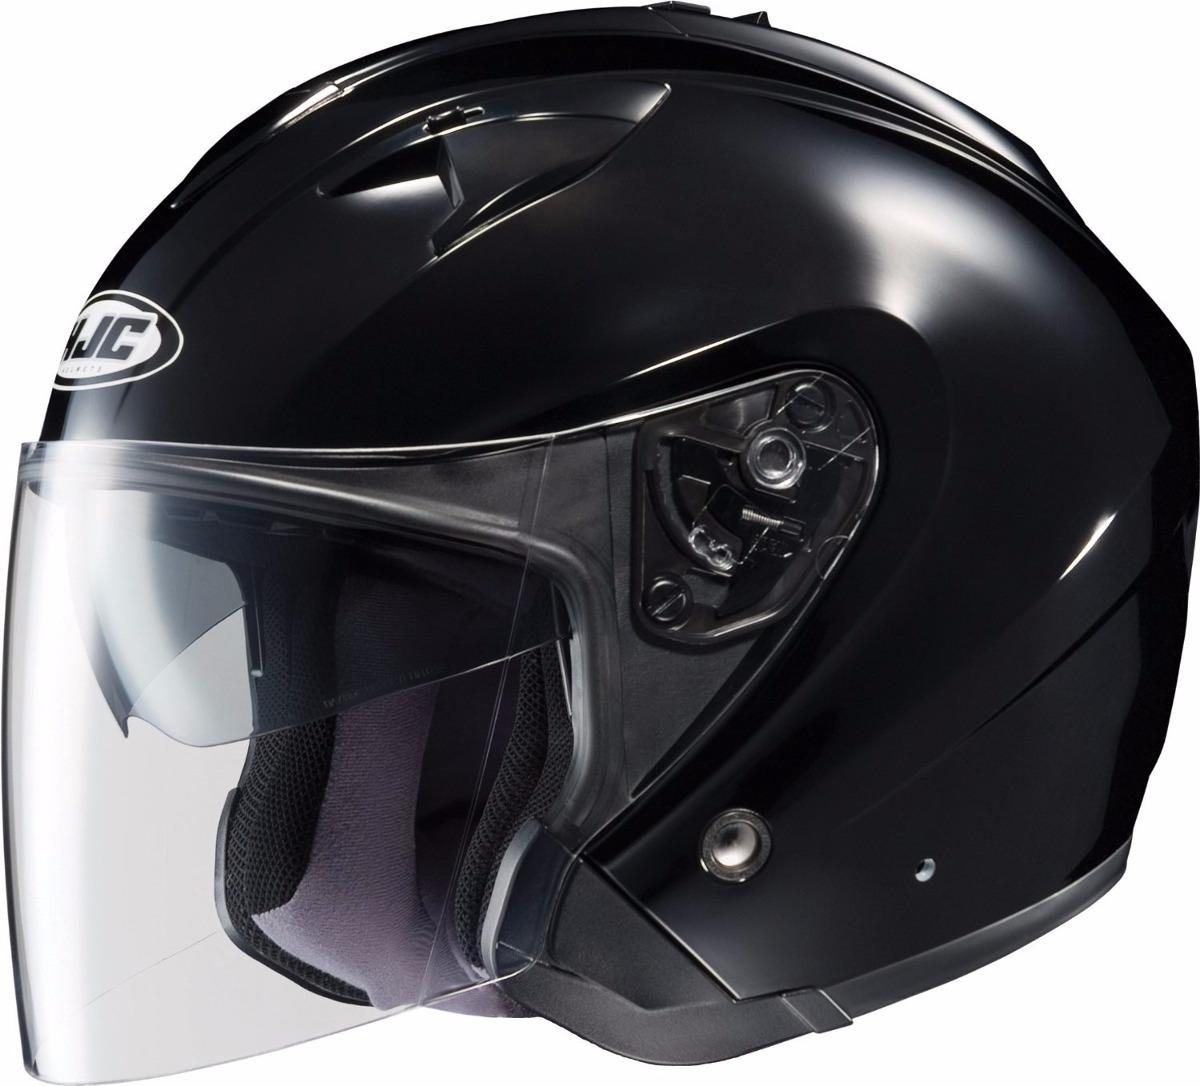 hjc helmets is 33 helmet matte black x large 6 en mercado libre. Black Bedroom Furniture Sets. Home Design Ideas